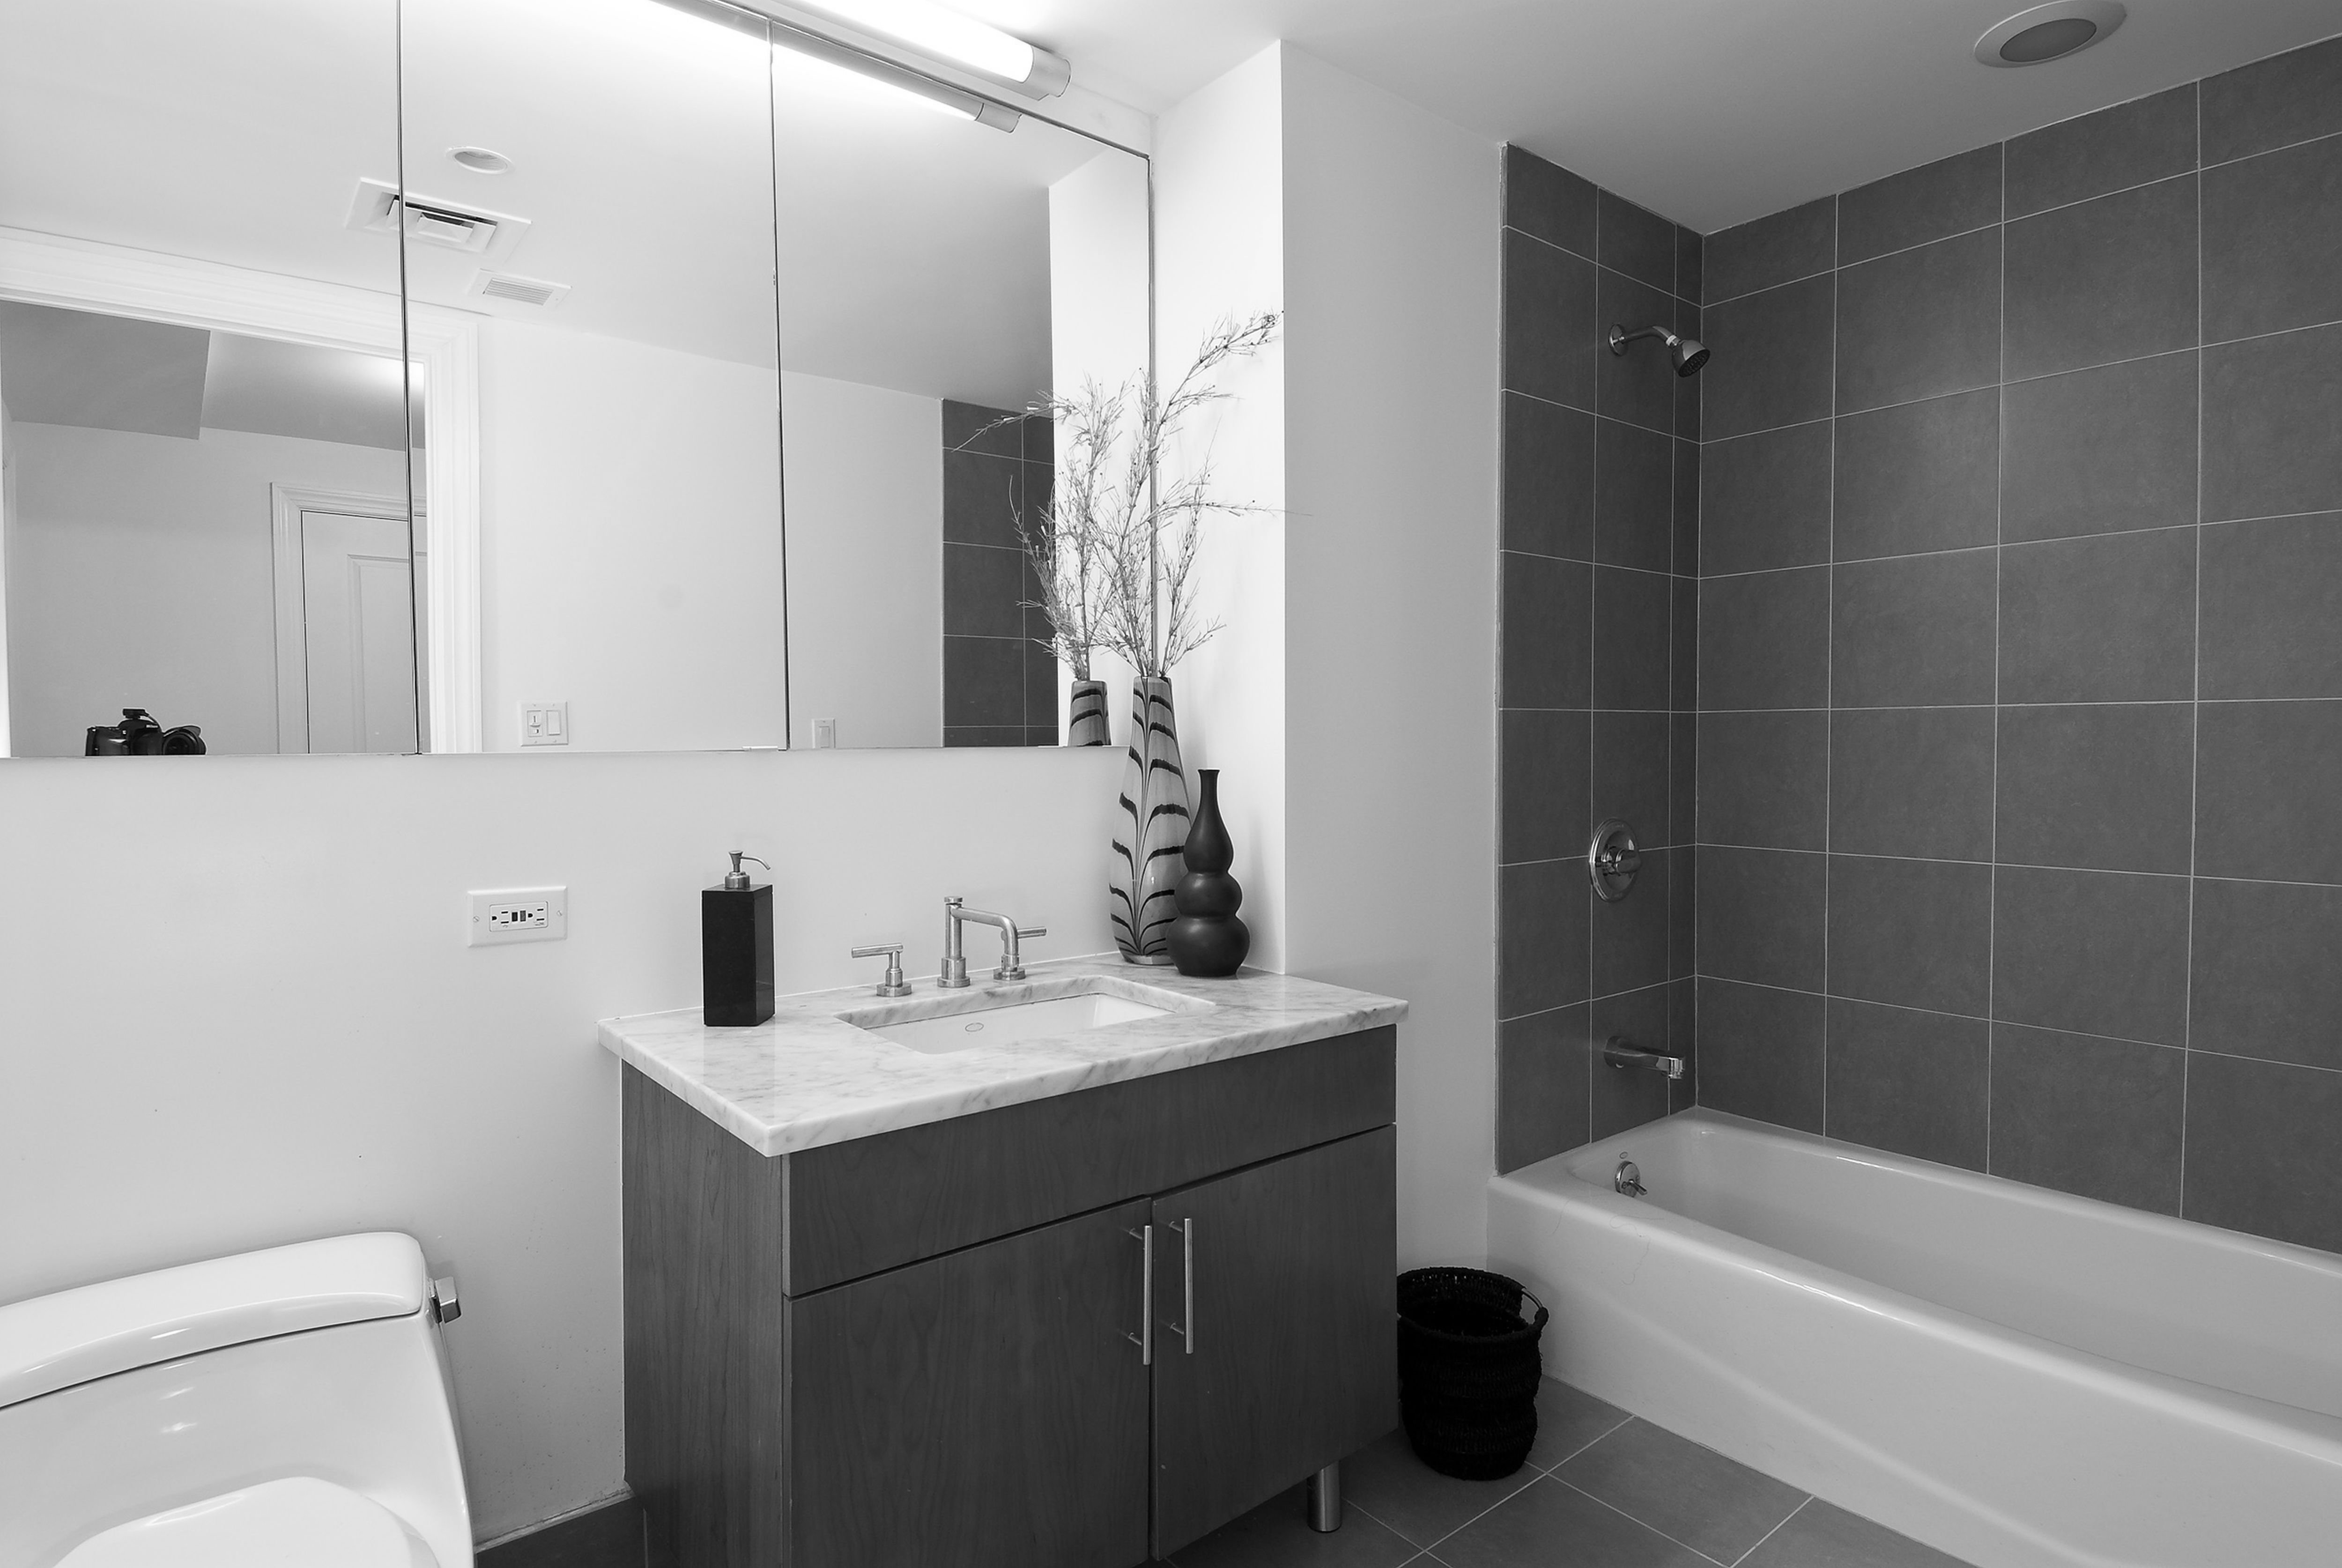 10 Lovable Gray And White Bathroom Ideas gray bathroom designs beautiful small bathroom grey bathroom ideas 2020